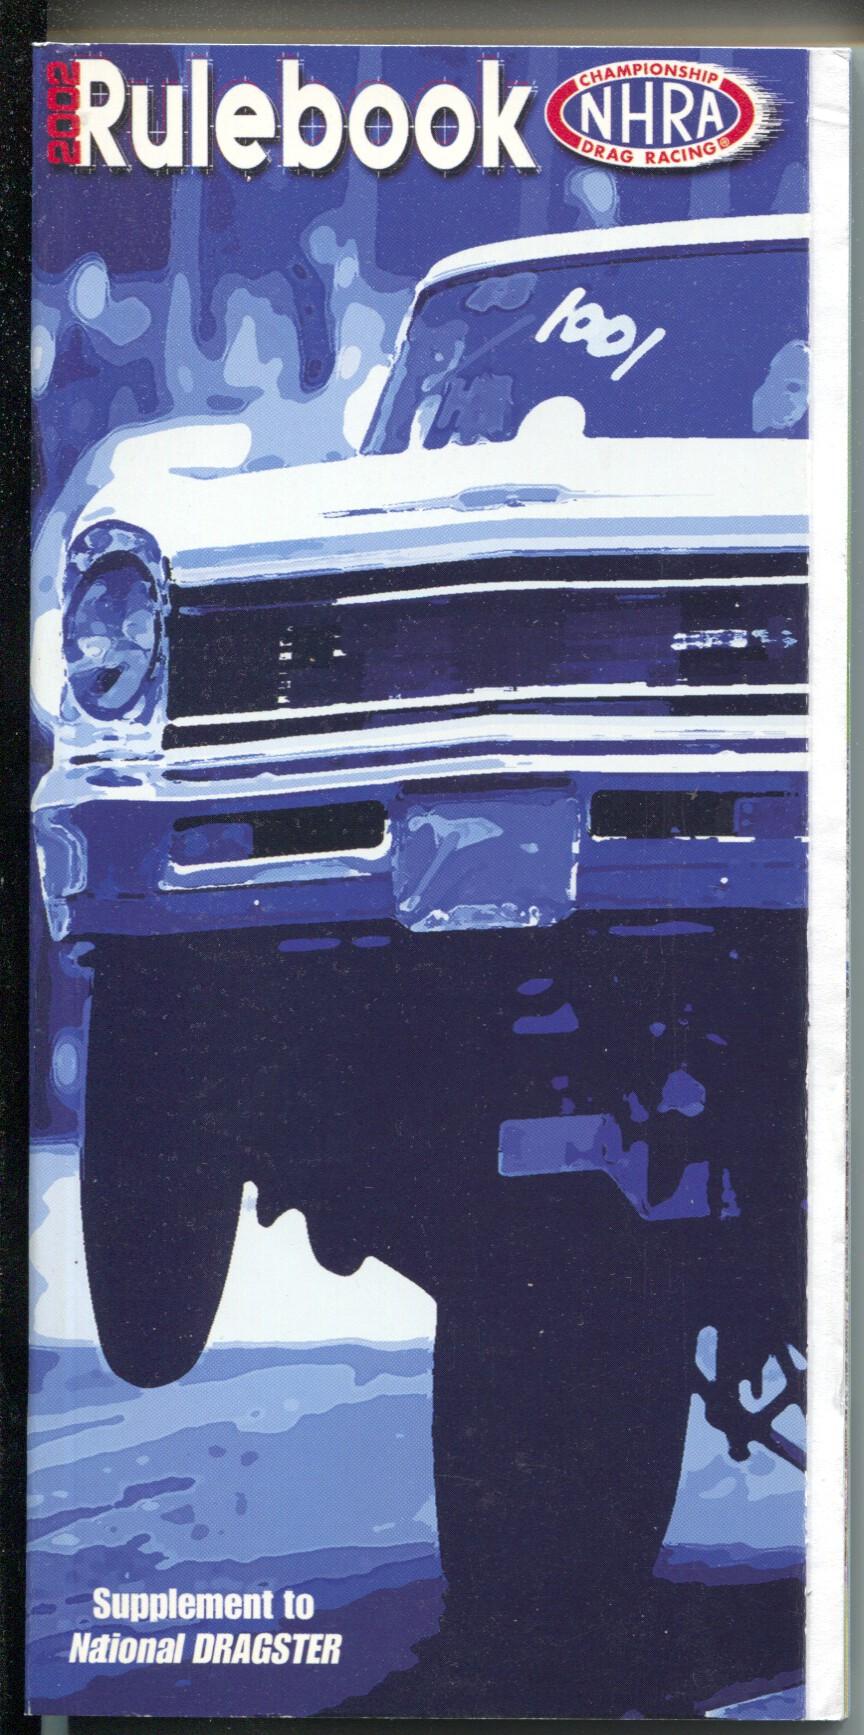 National Hot Rod Association Rule Book Nhra 2002 Rules Diagrams Pix Car Wiring Diagram